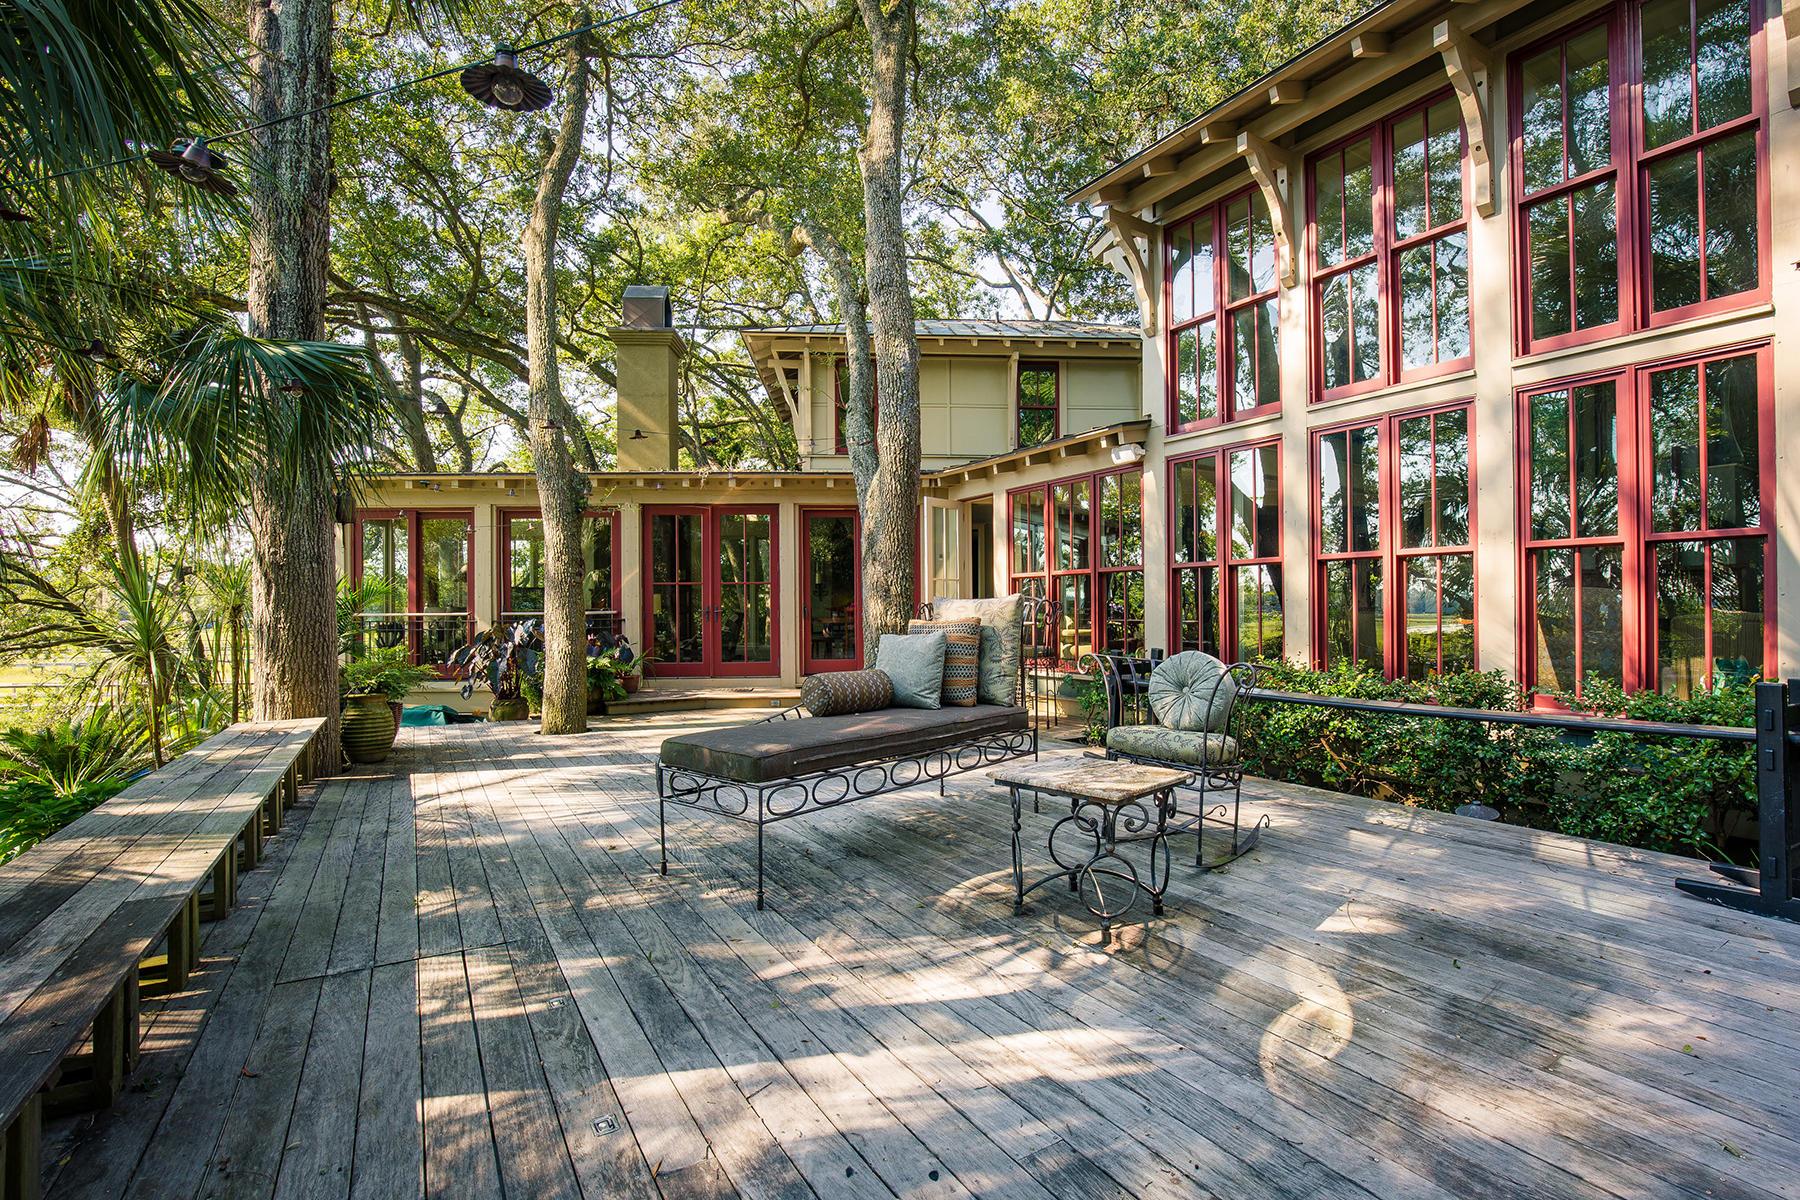 Ellis Oaks Homes For Sale - 672 Ellis Oak, Charleston, SC - 35